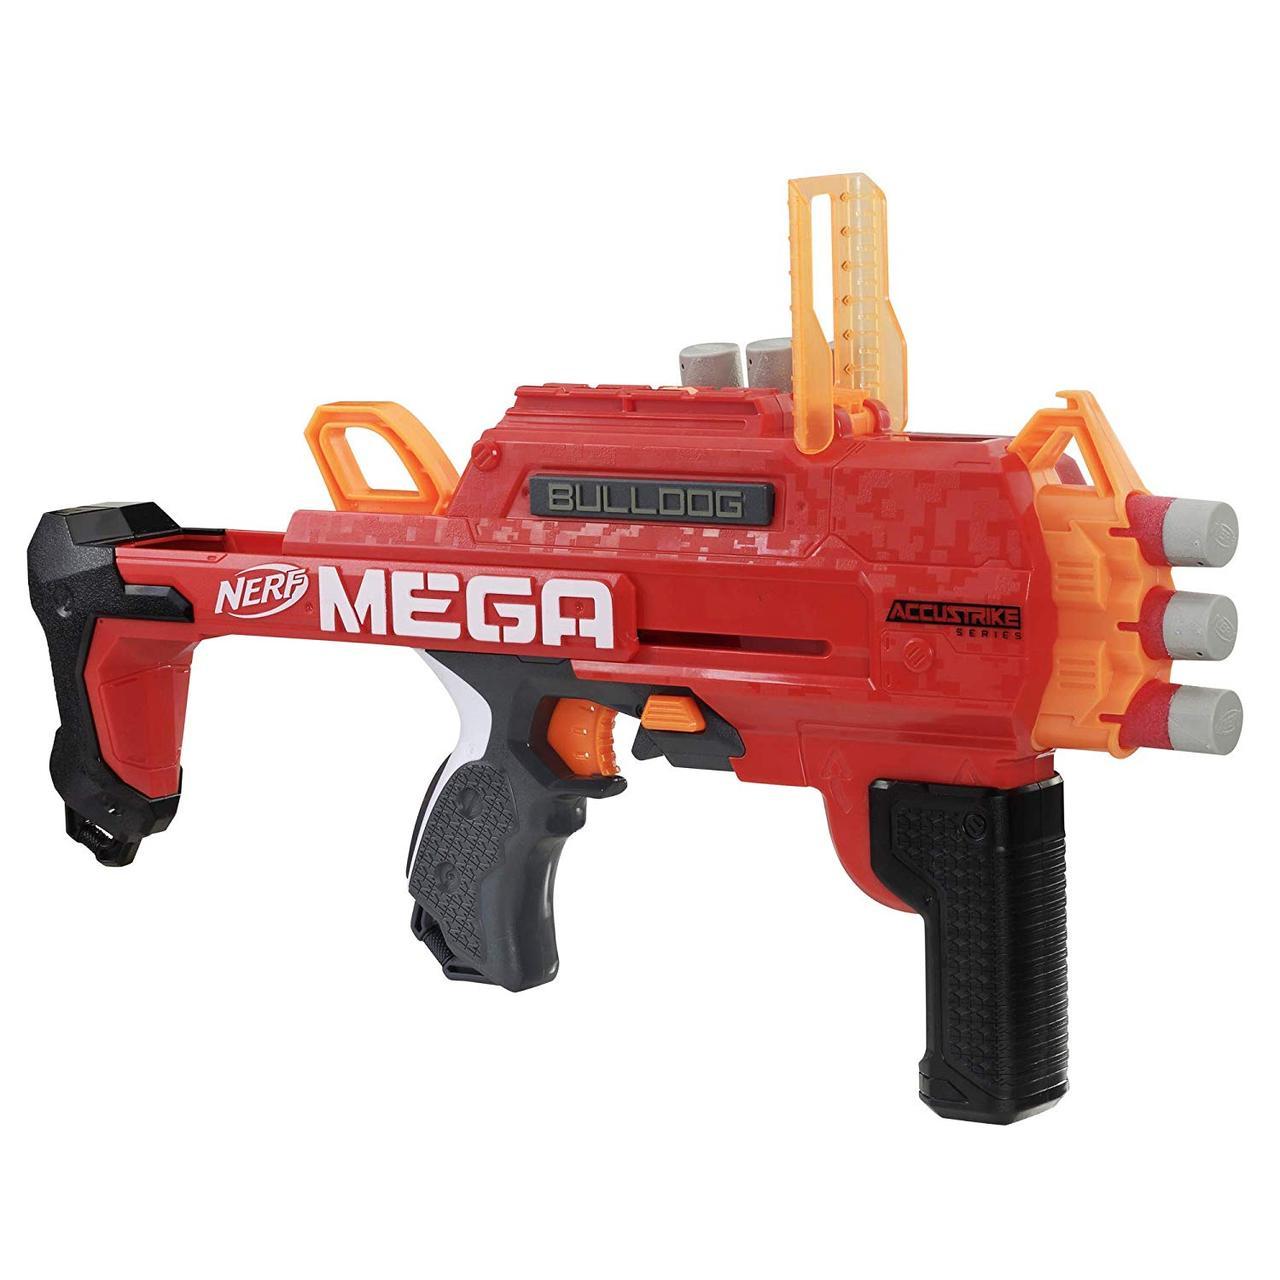 Бластер Нерф Мега Бульдог NERF Accustrike Mega Bulldog Toy